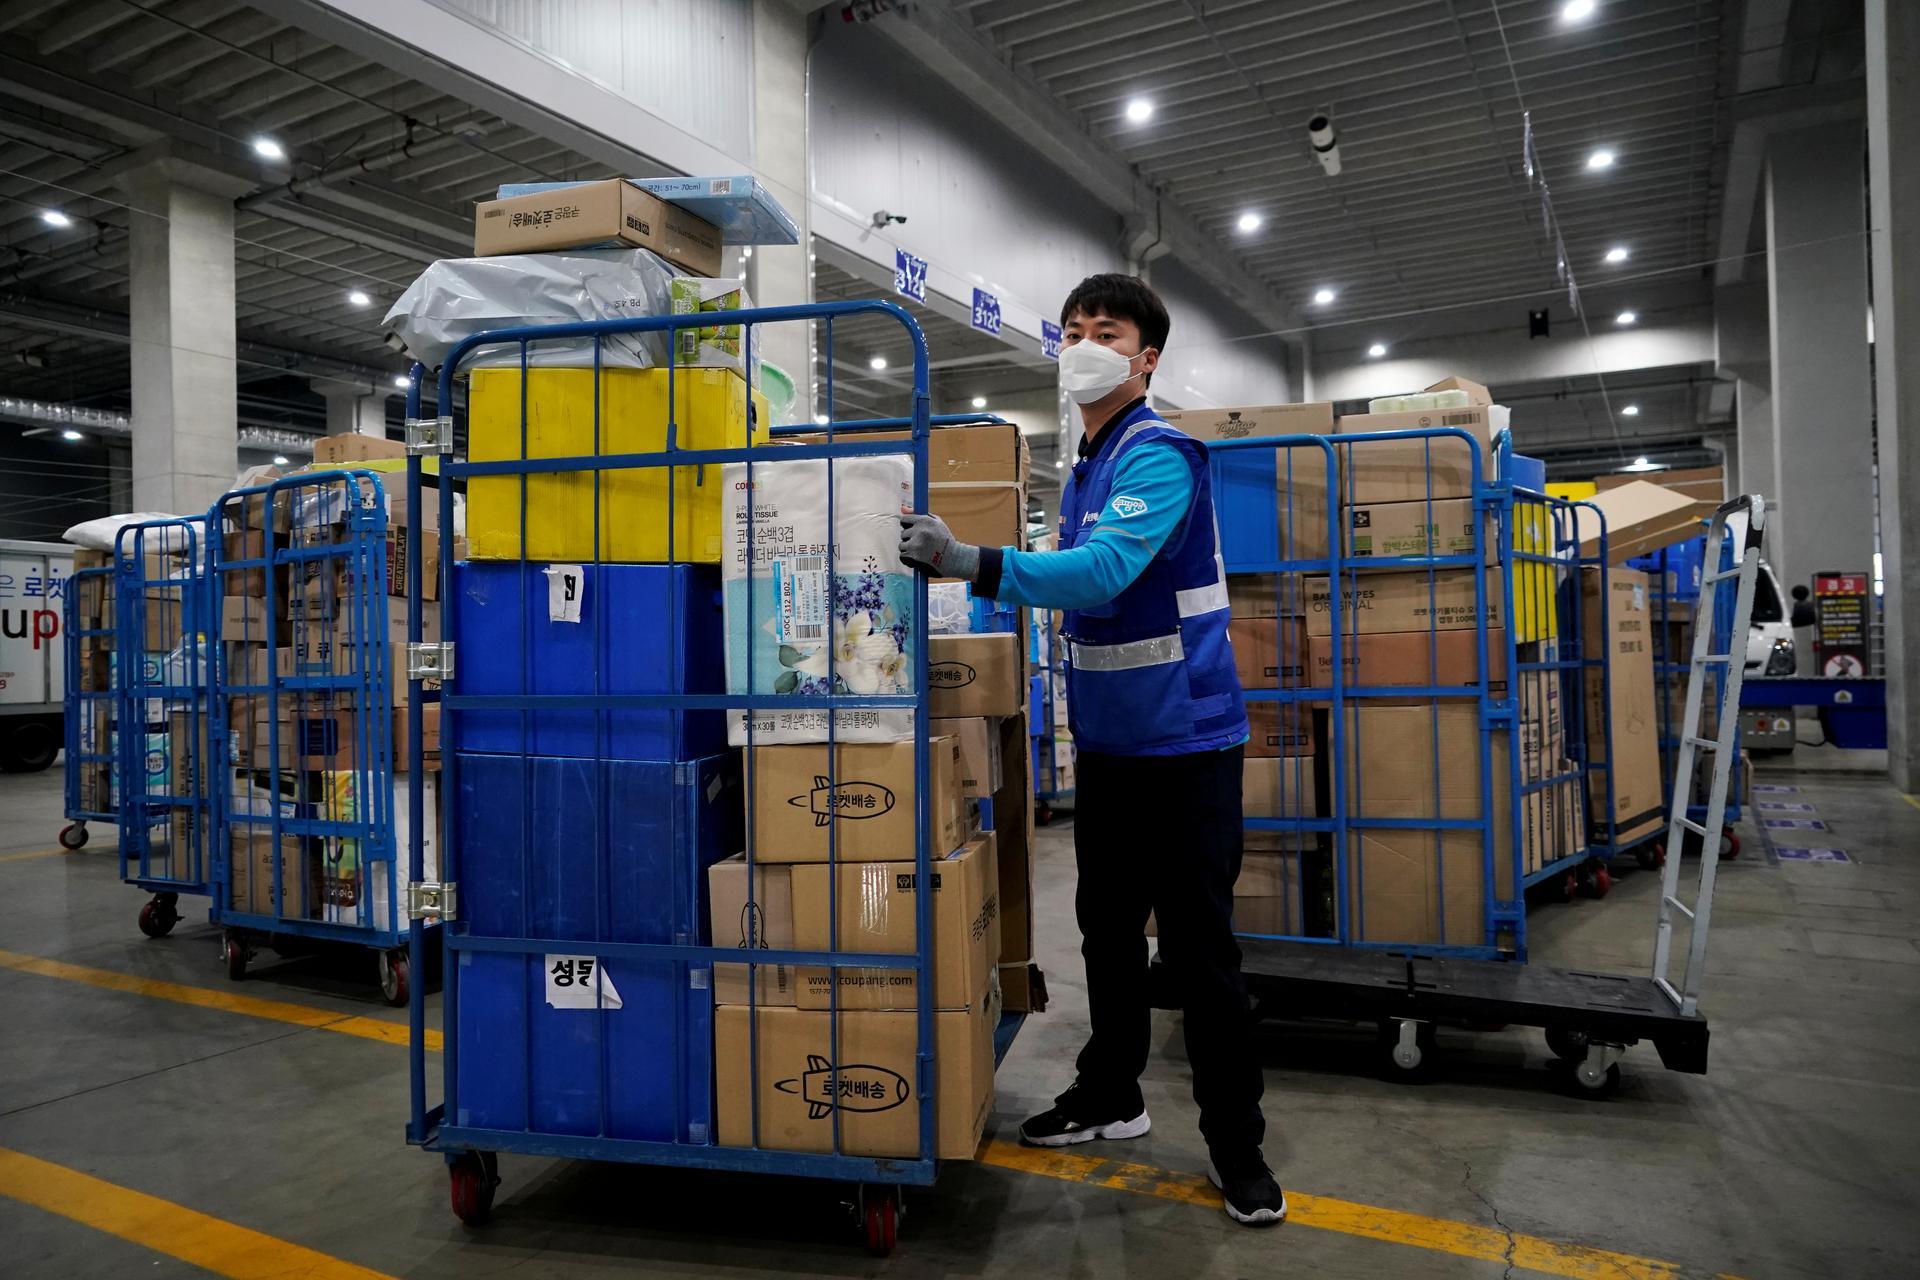 Coronavirus outbreak at South Korea e-commerce warehouse drives spike in new cases